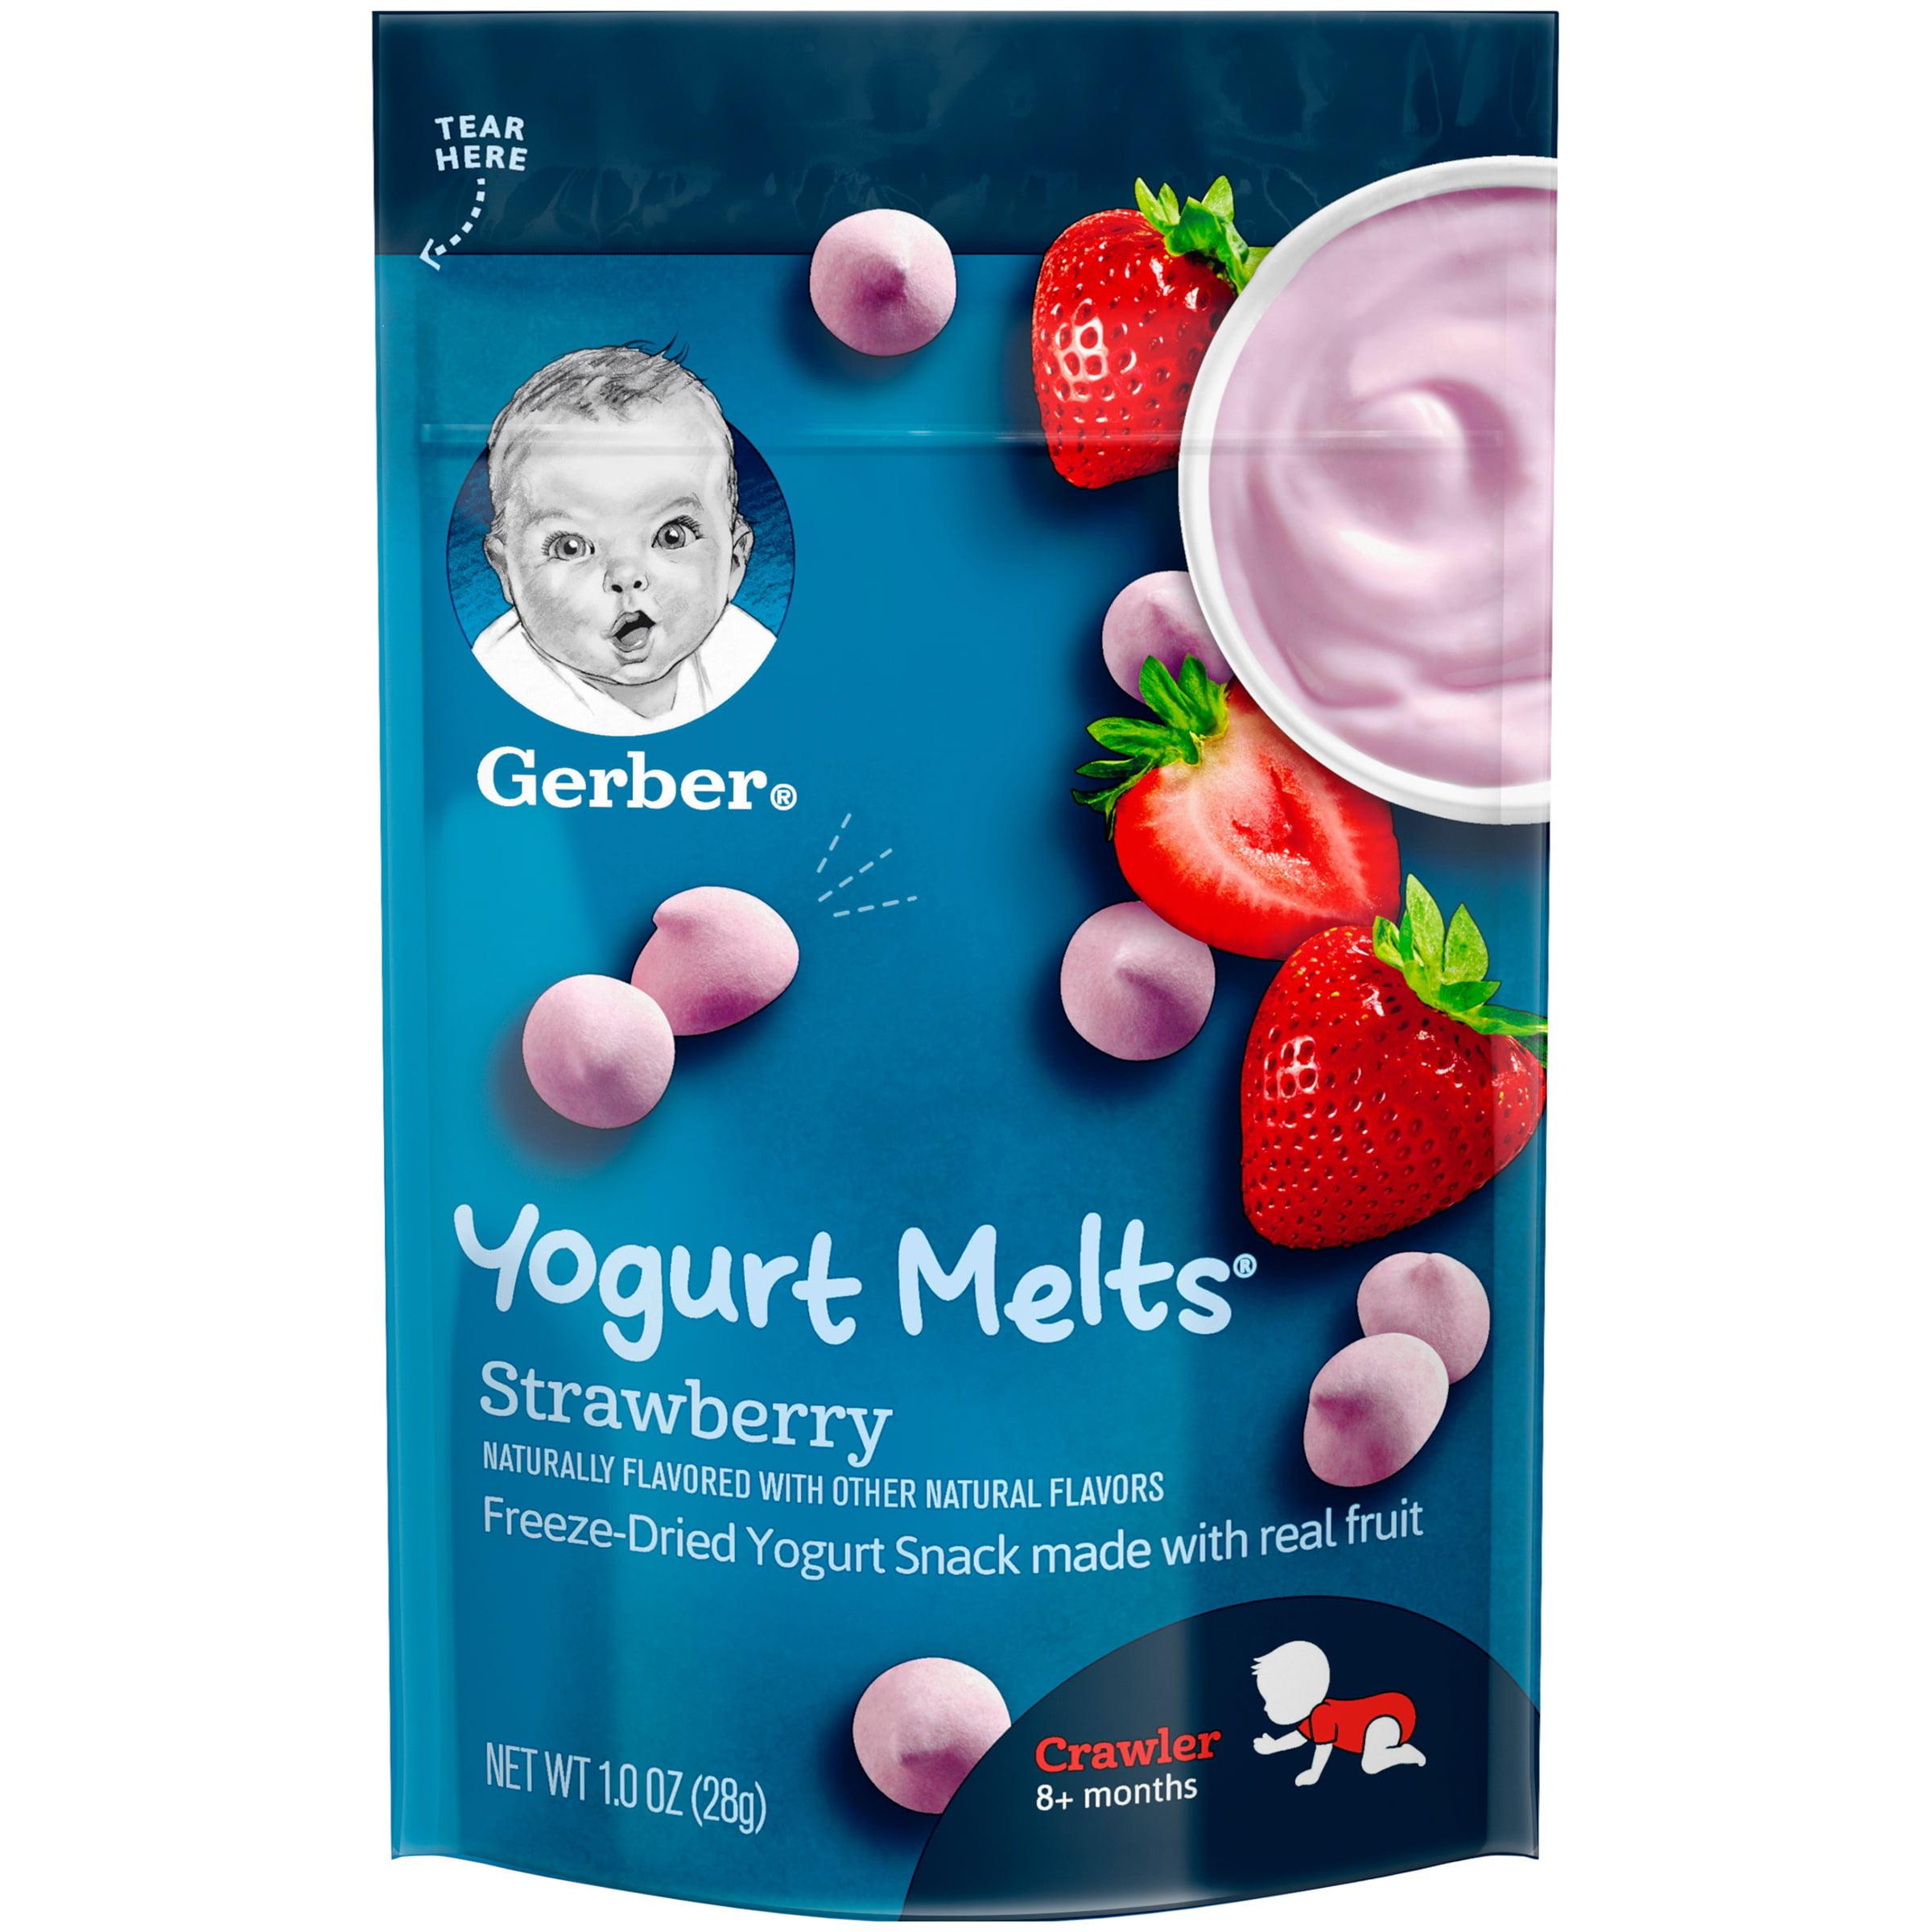 Gerber Yogurt Melts, Strawberry, 1 oz.